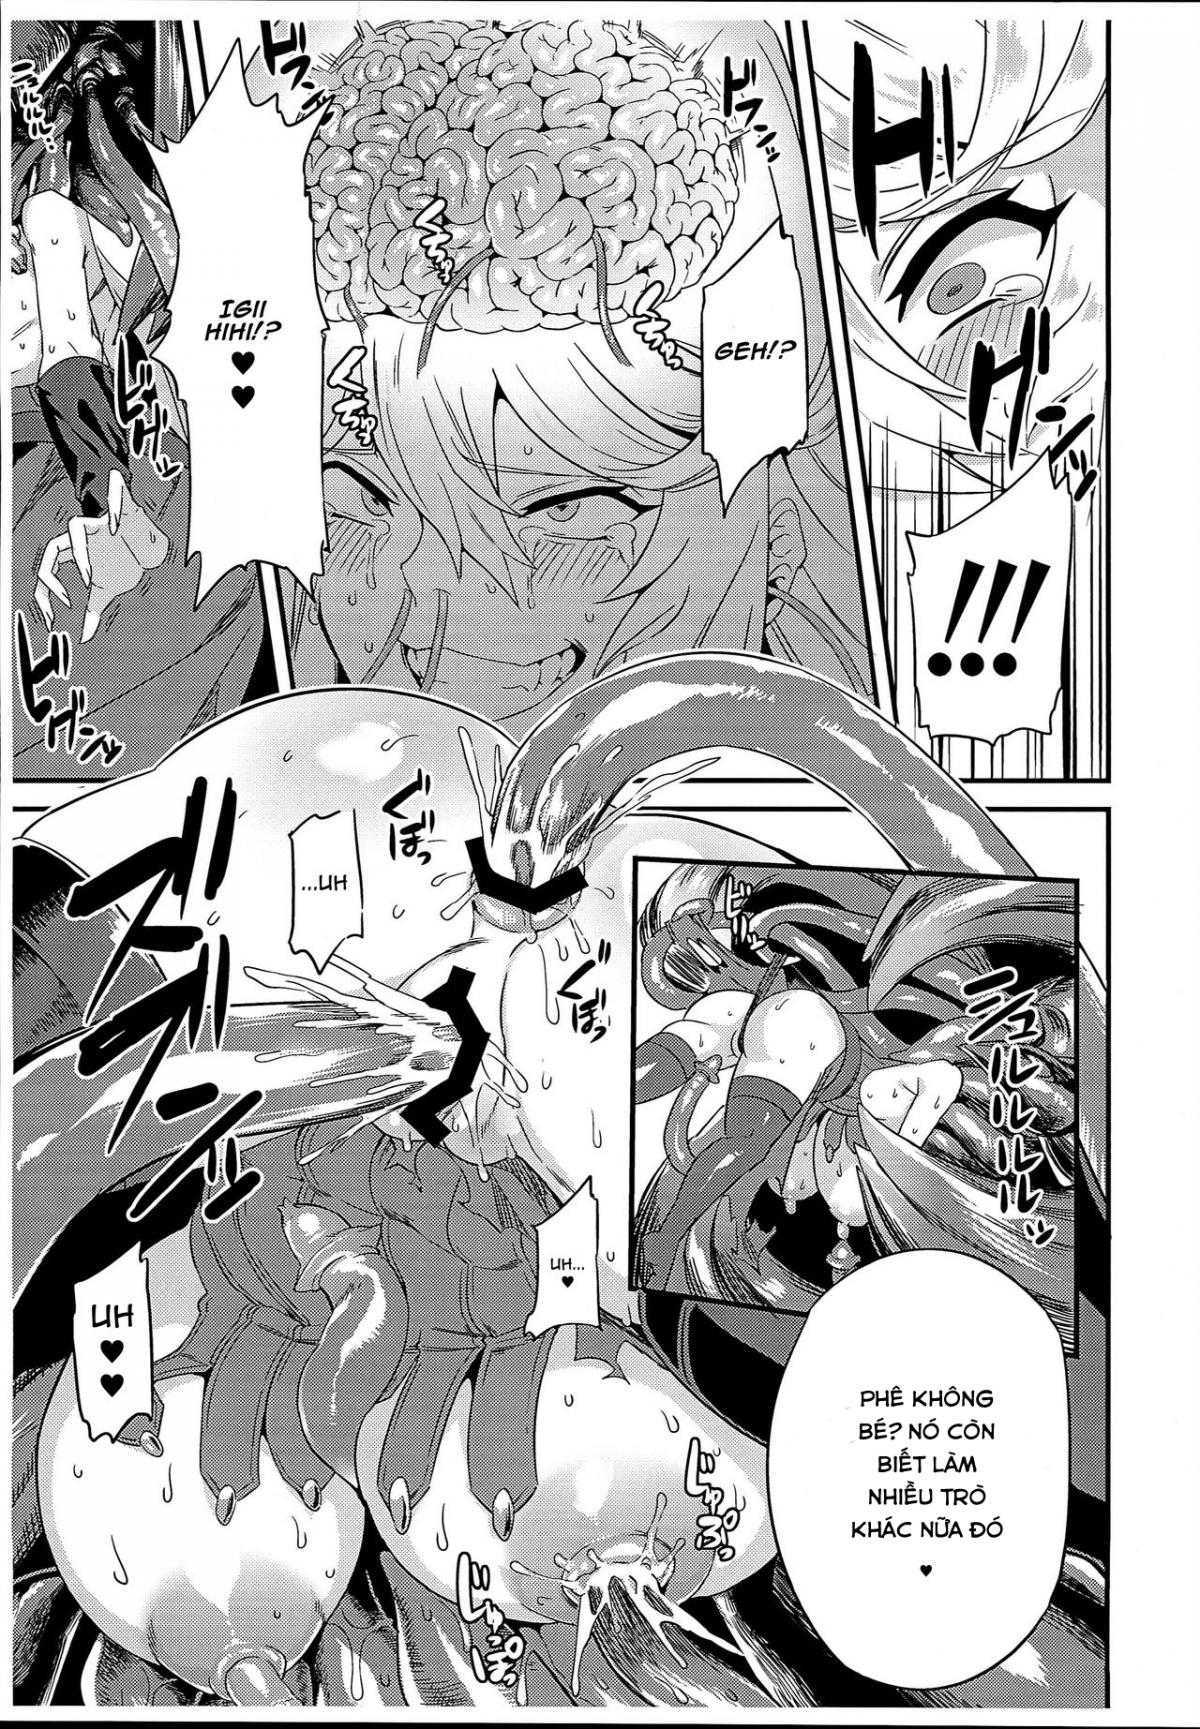 Hình ảnh  trong bài viết Truyện hentai Hentai Draph Bokujou Gaiden